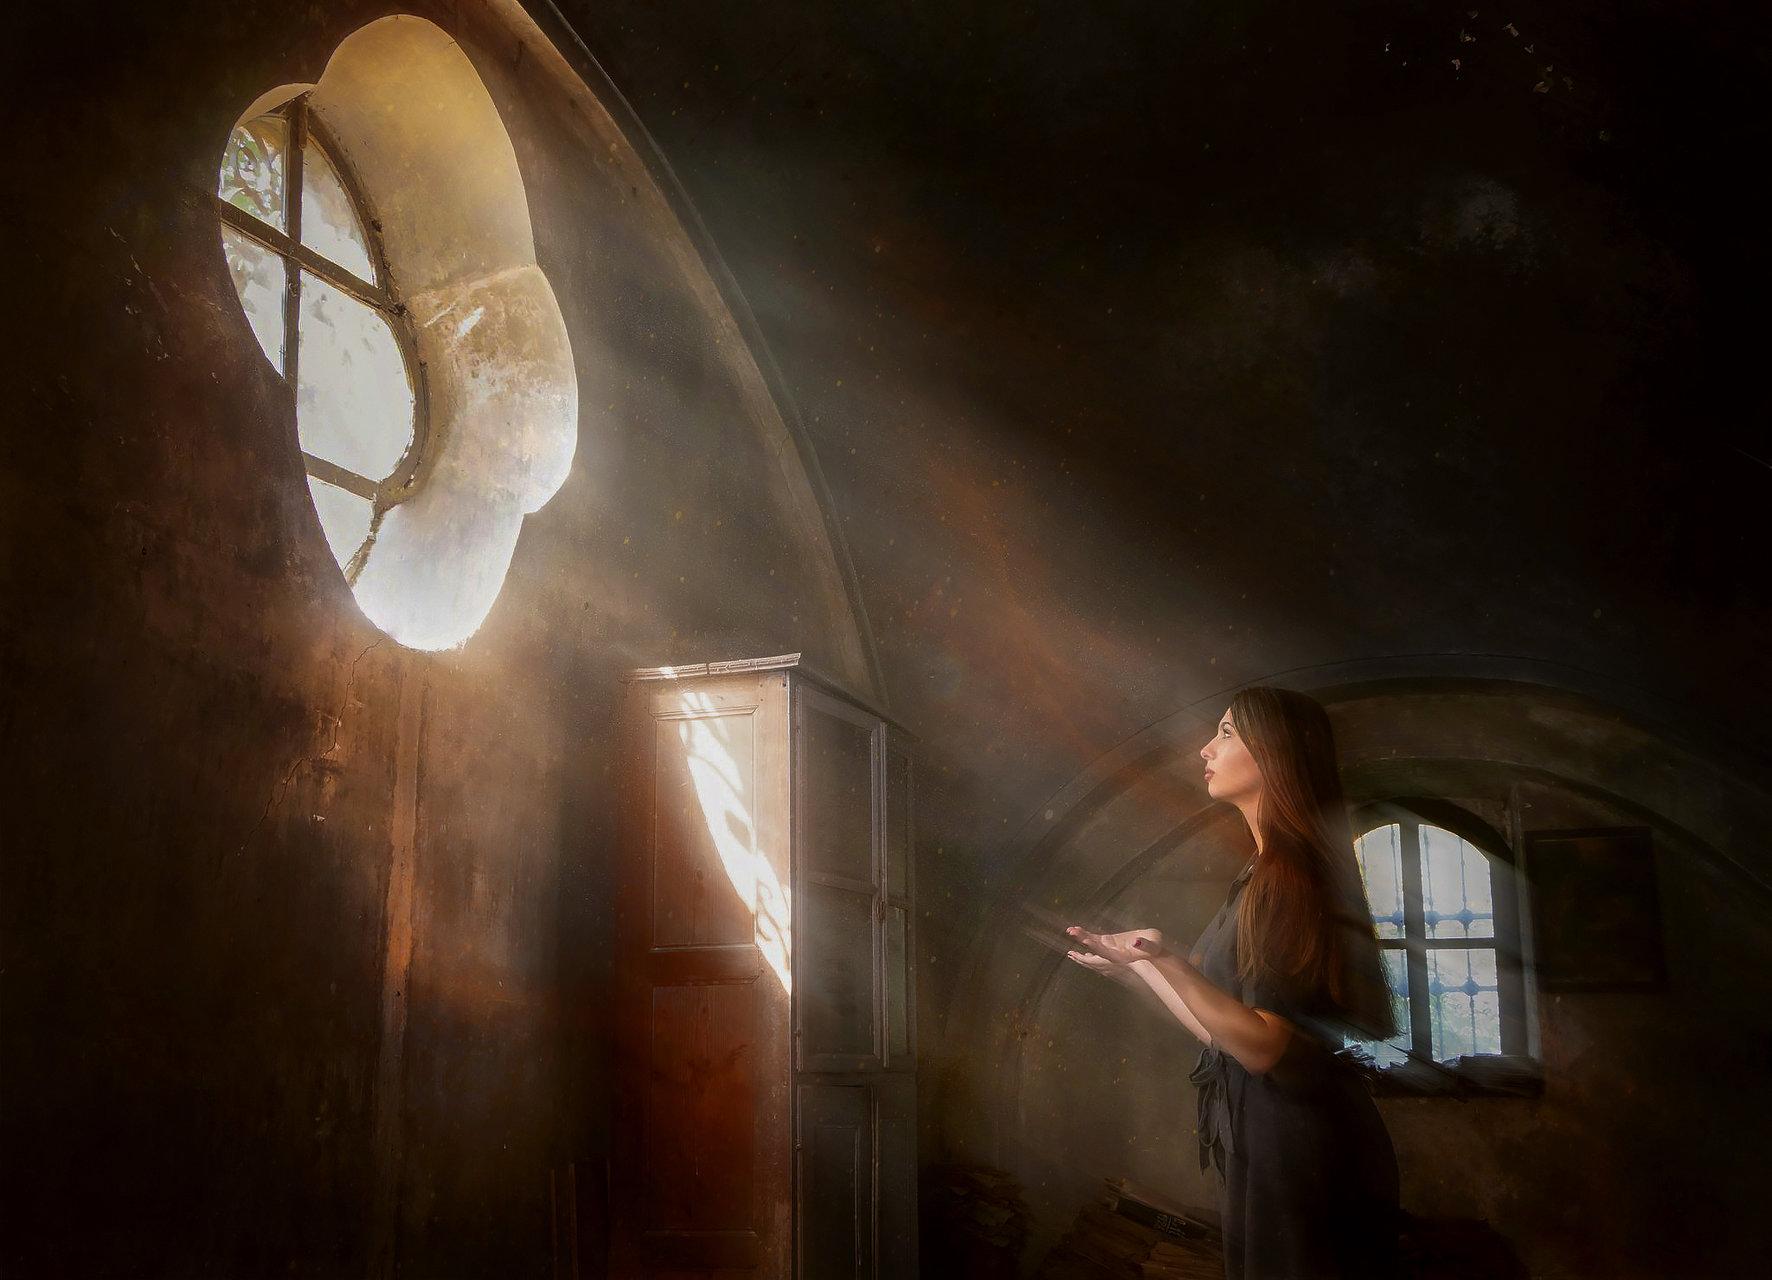 Photo in Portrait | Author Georgi Popov - pandishpan | PHOTO FORUM